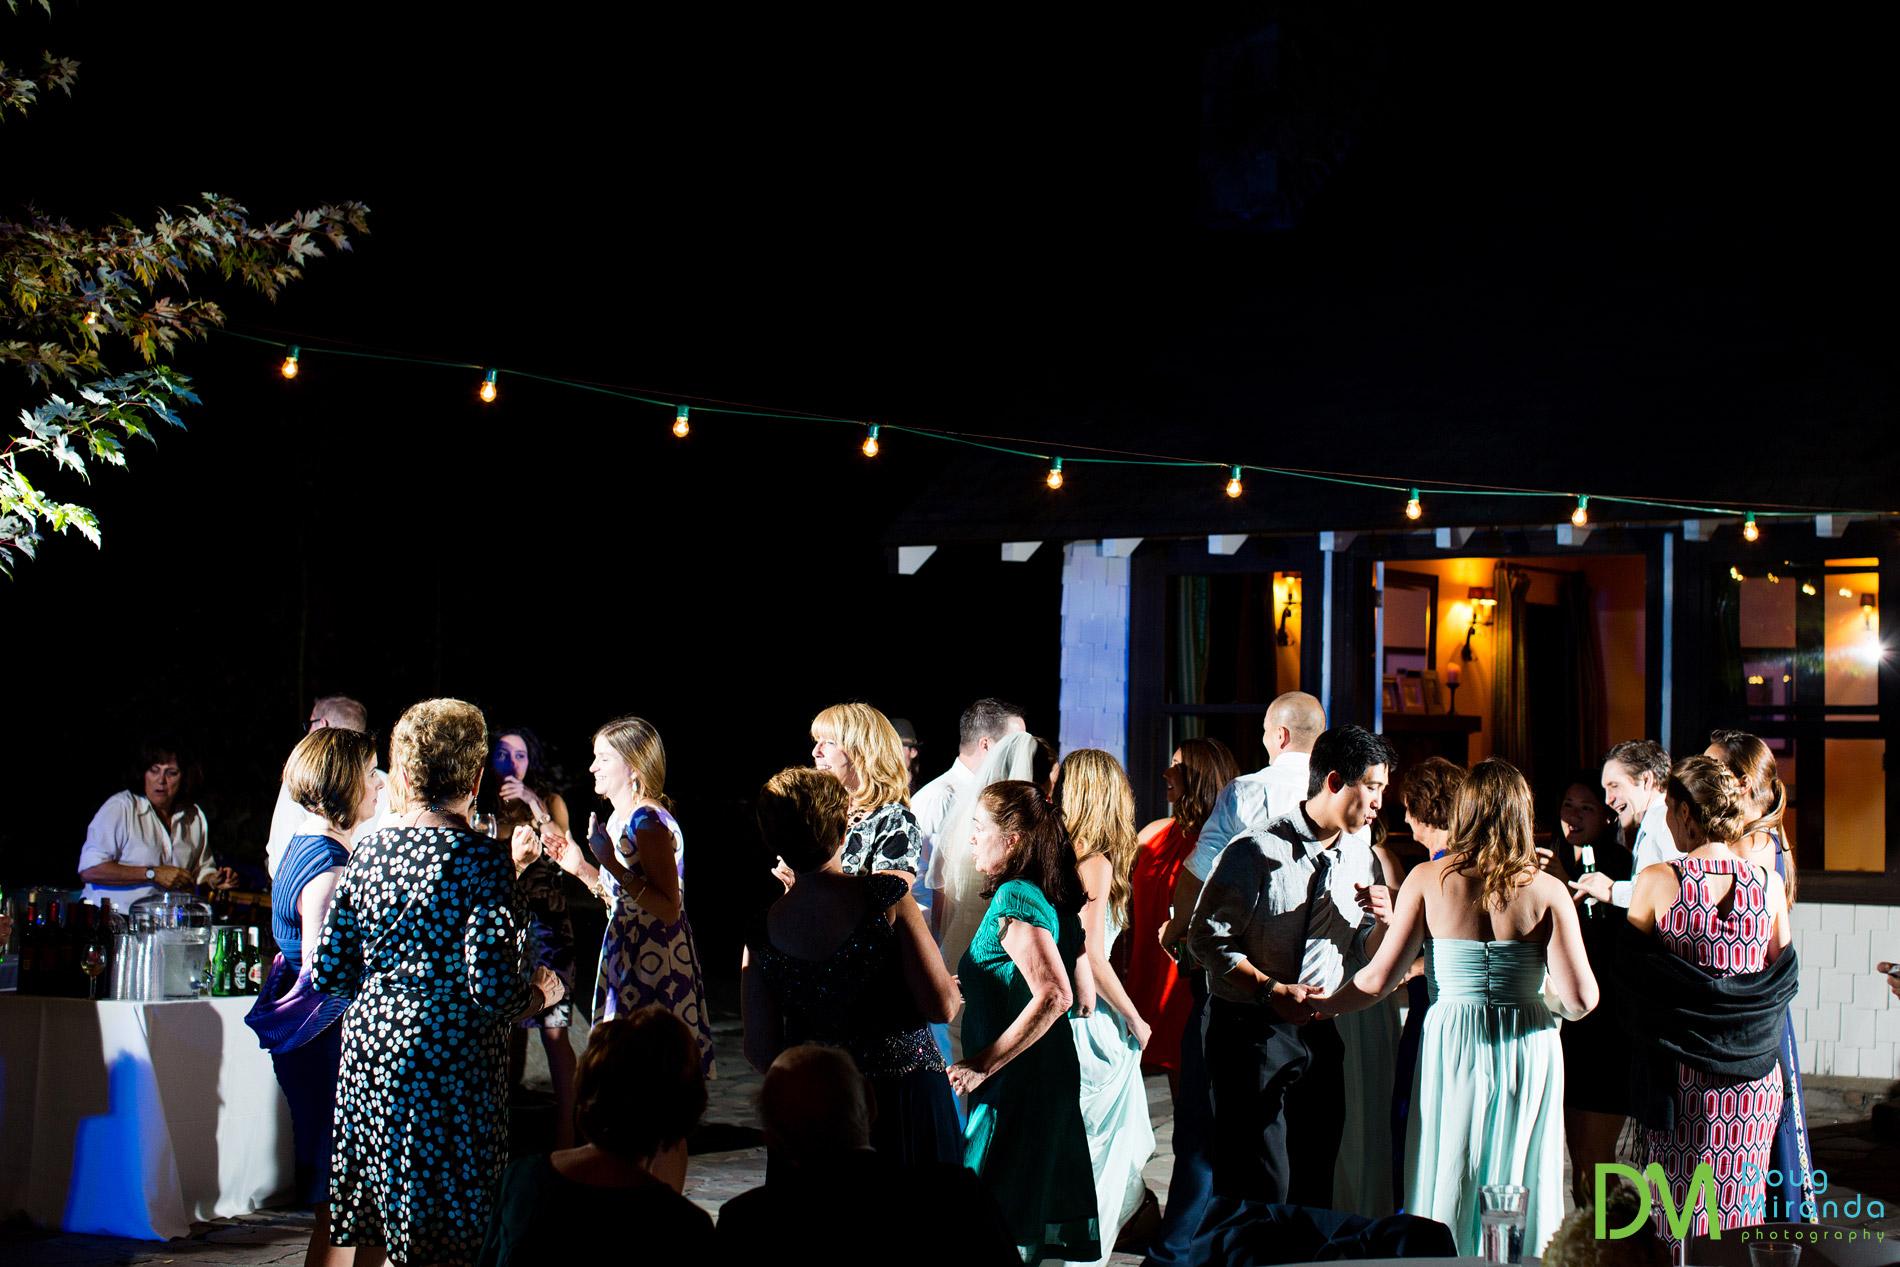 tahoe city wedding photography